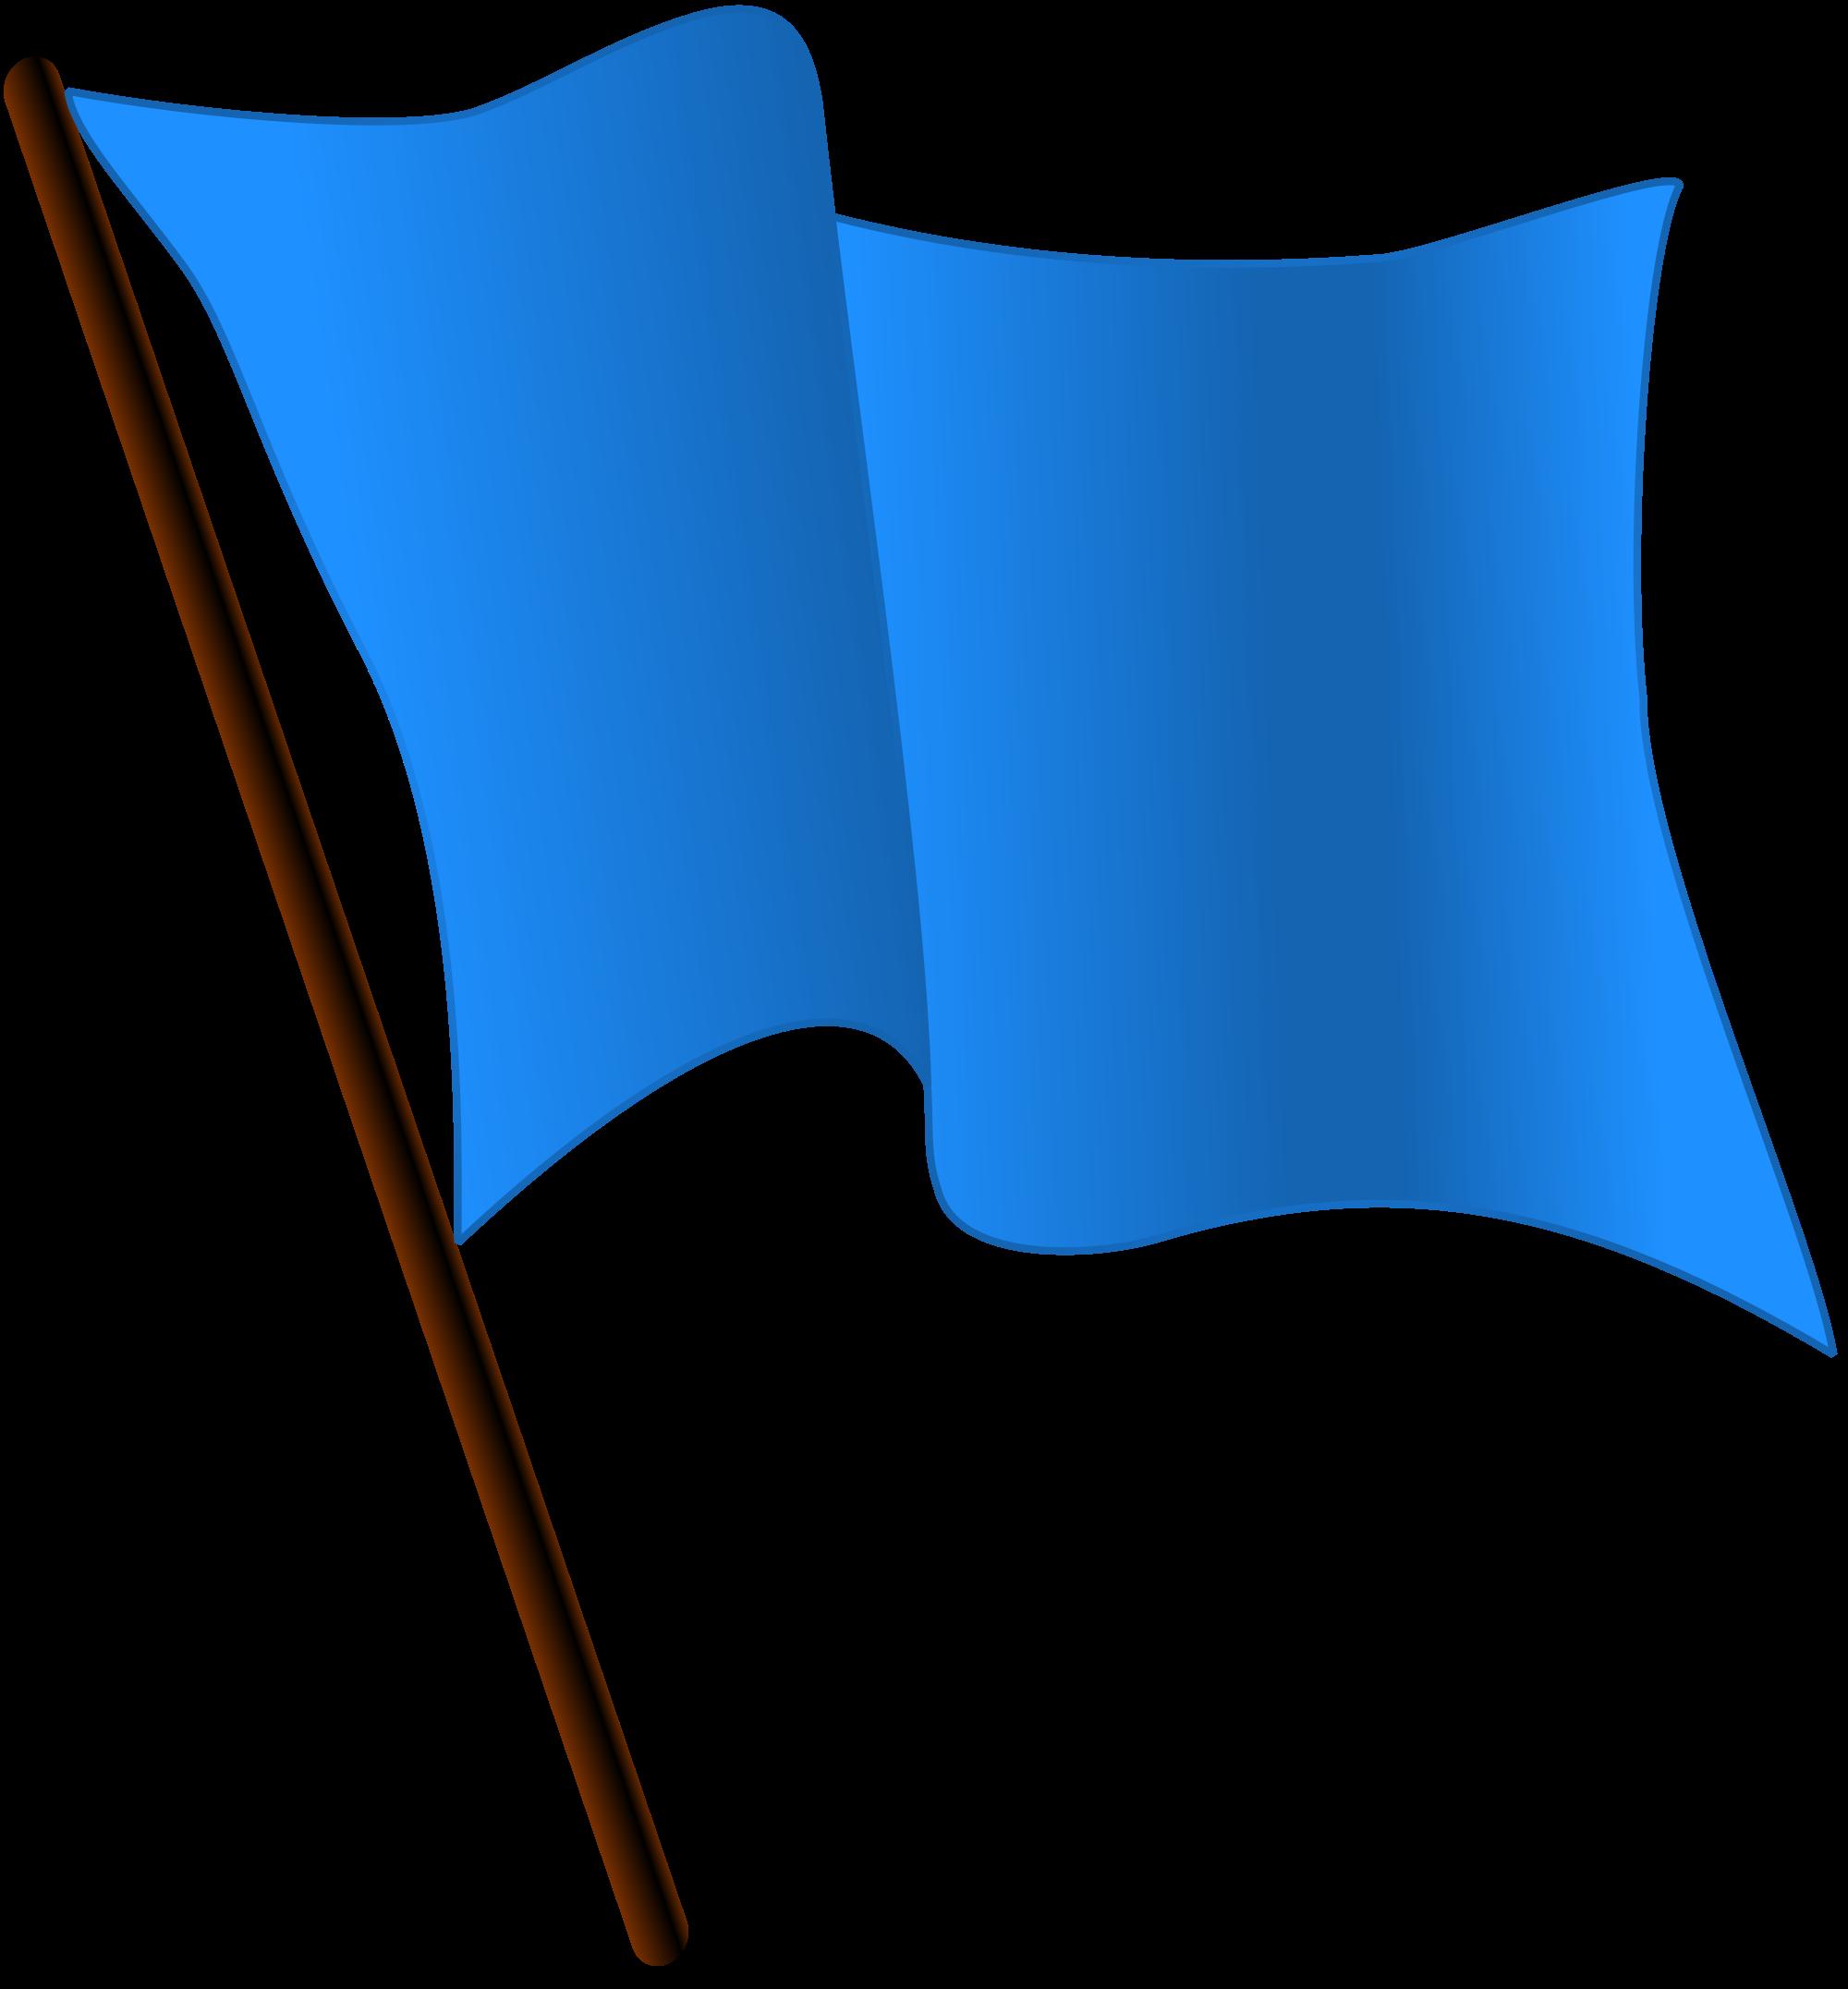 Pillow clipart svg. File dodgerblue flag waving